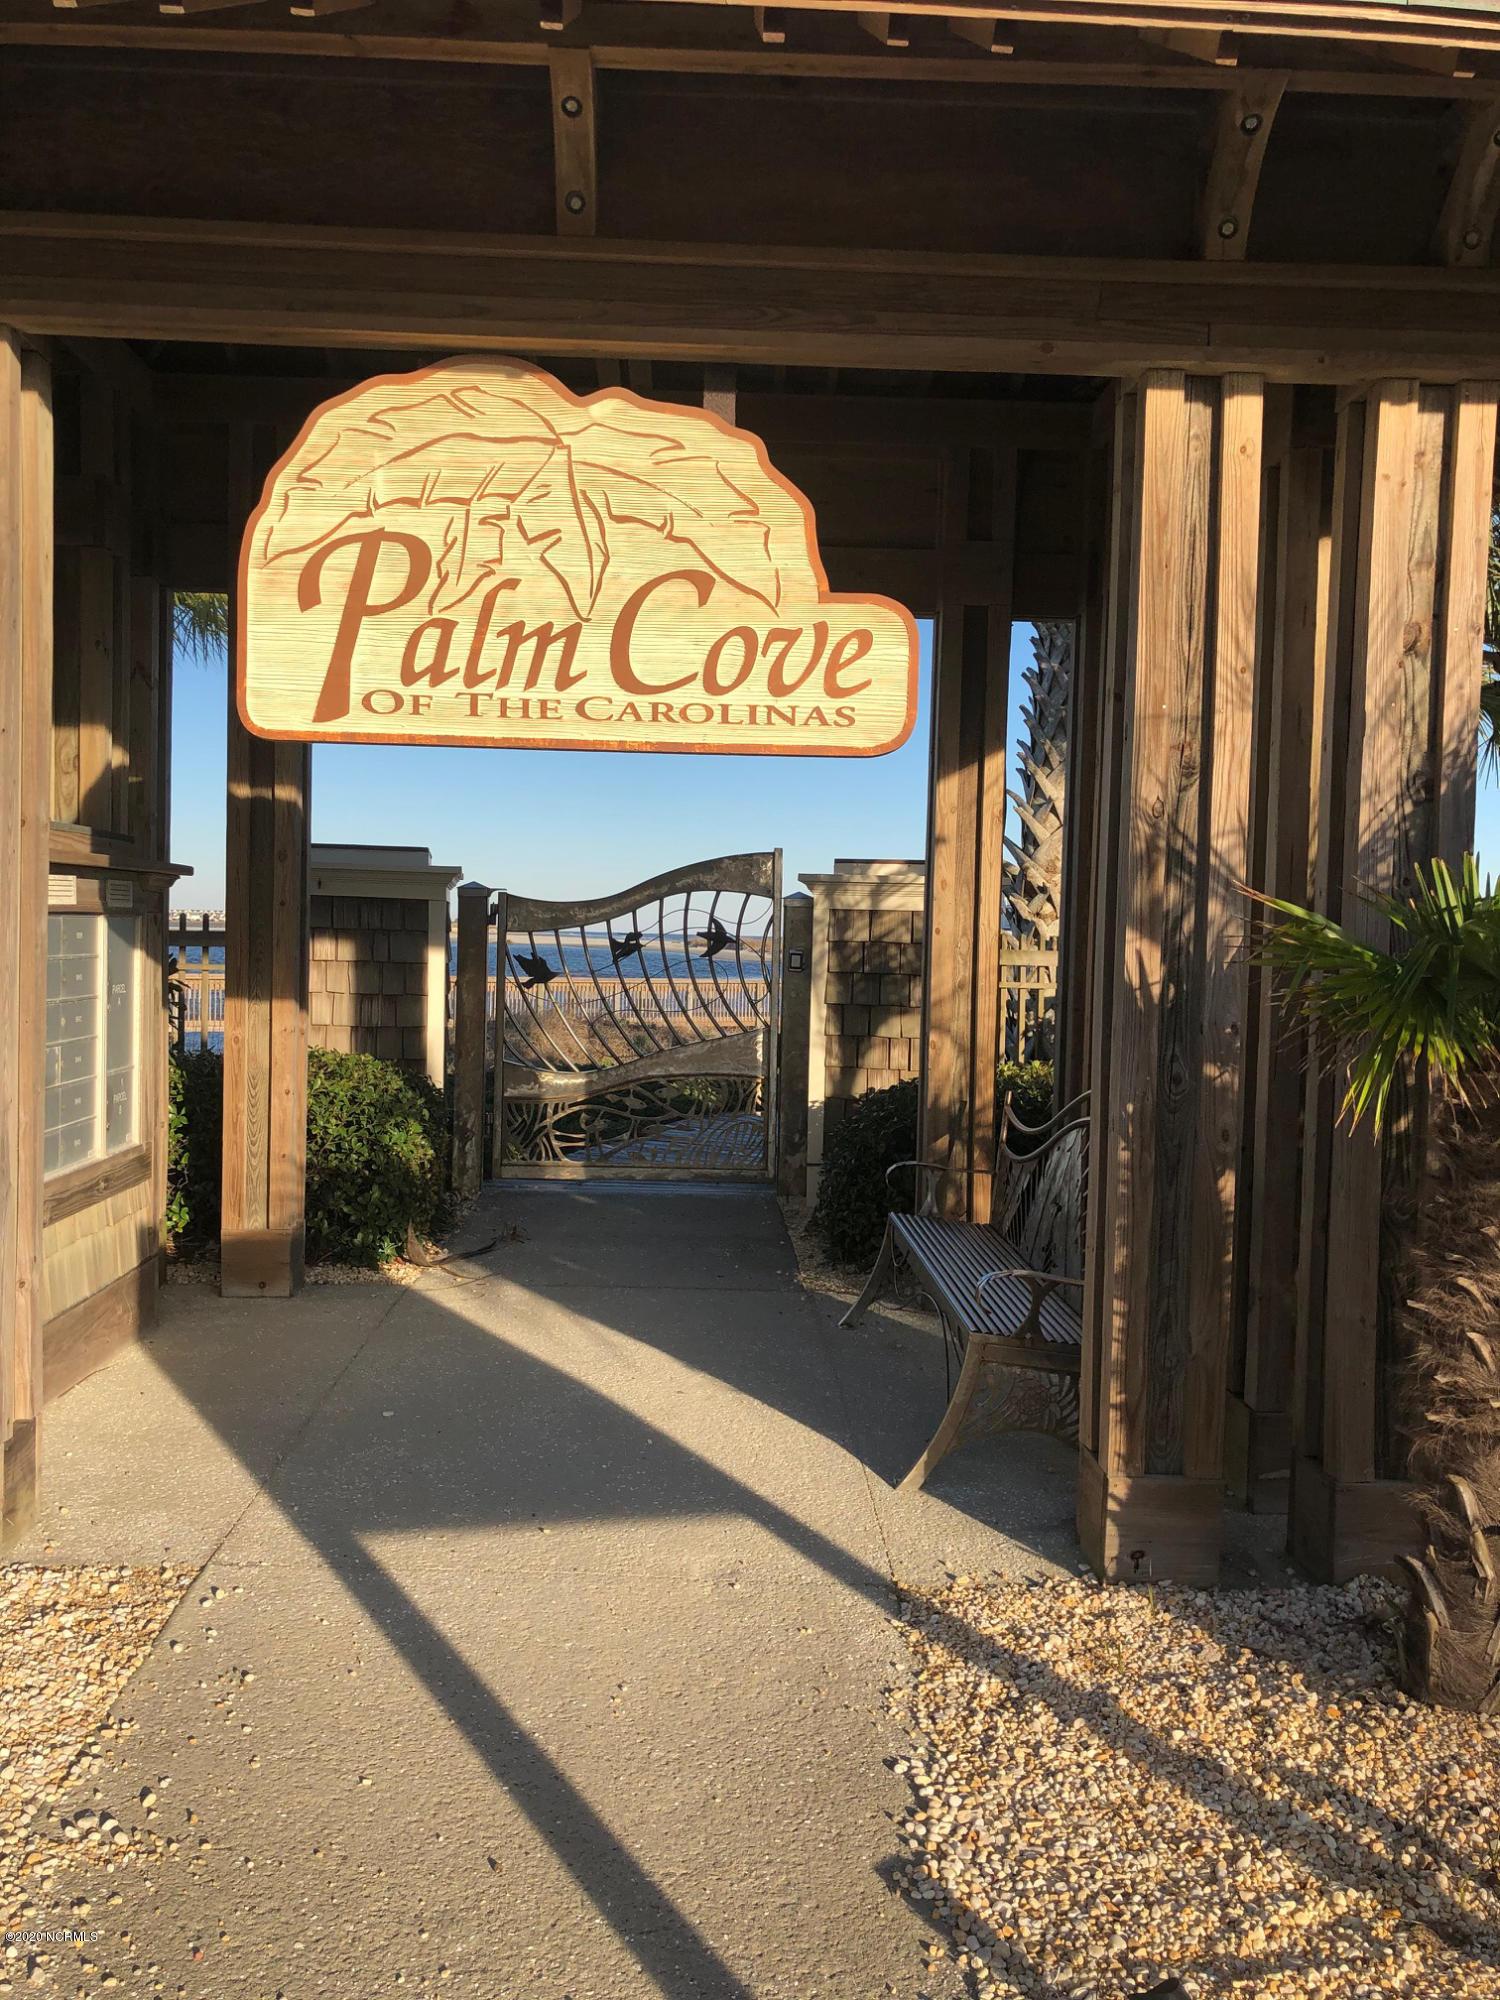 Lot 4 Palm Cove Sunset Beach, NC 28468